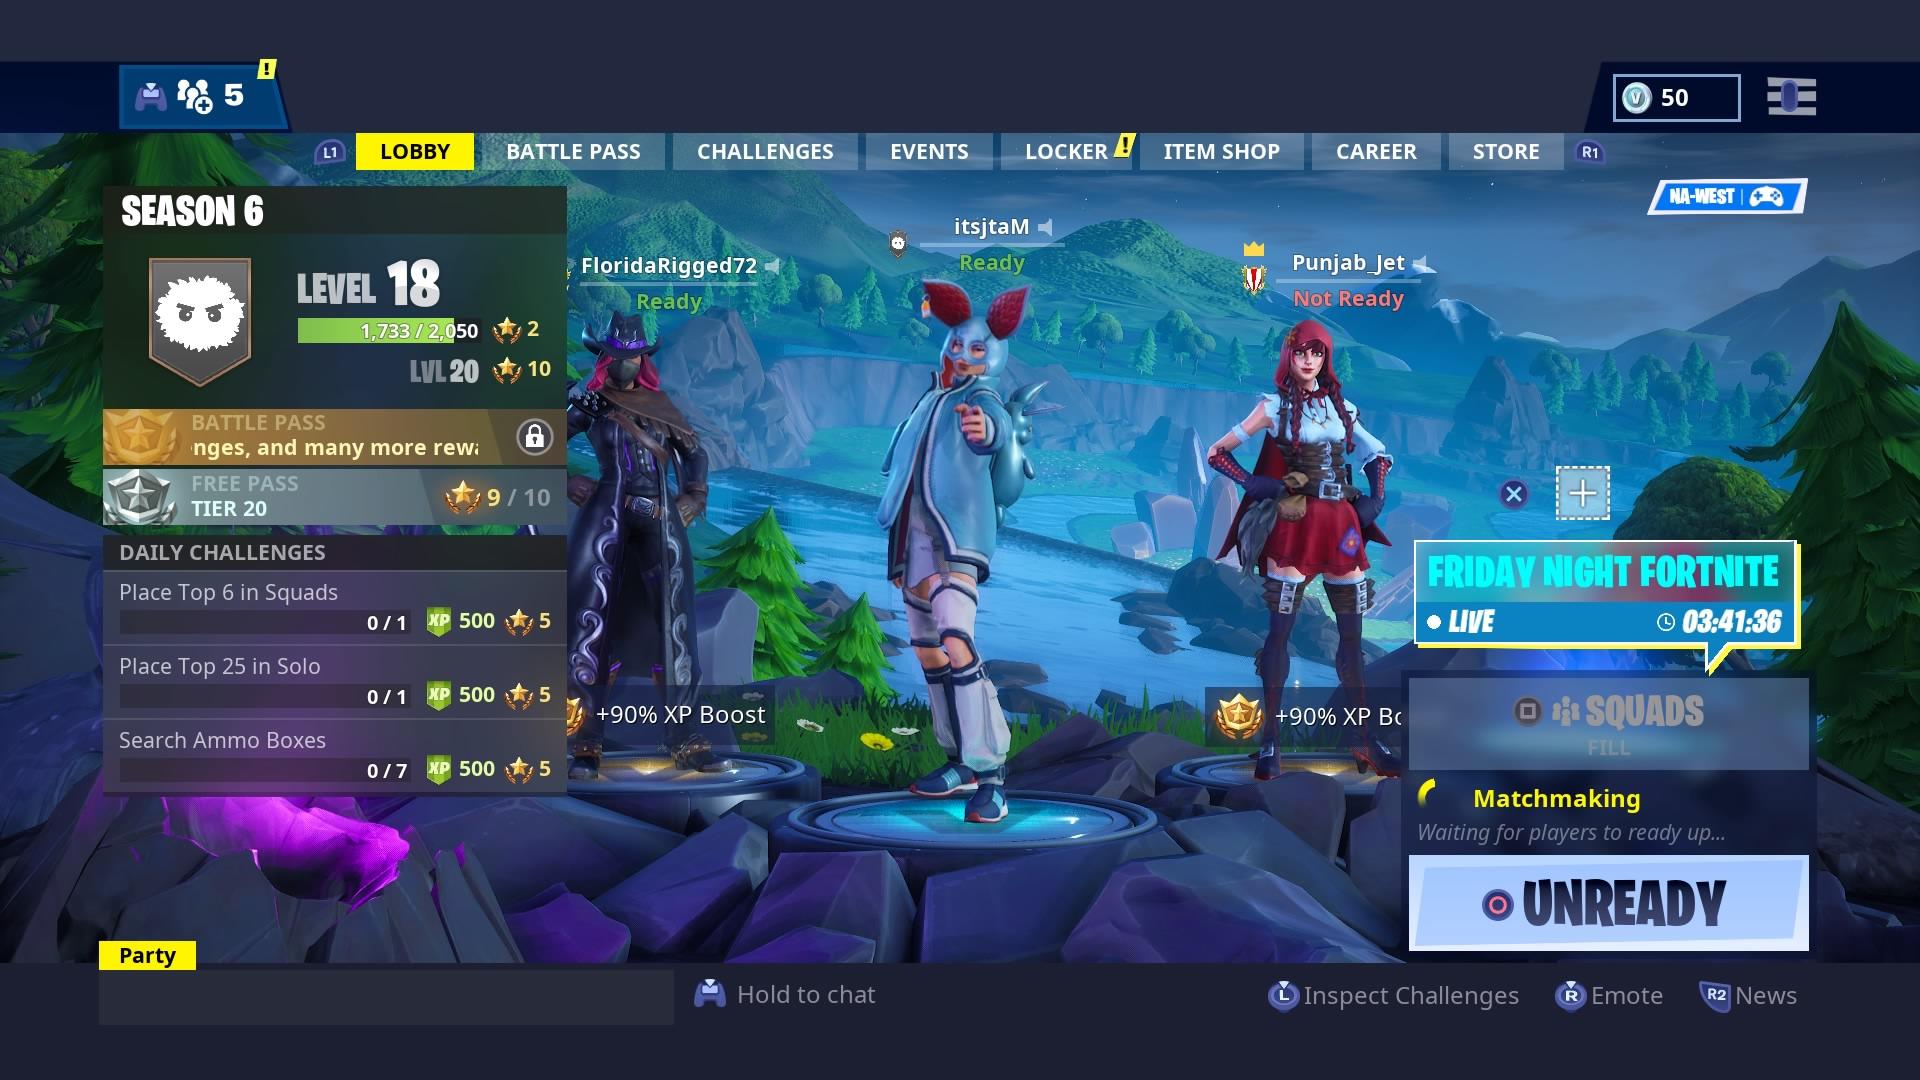 fortnite season 6 lobby screen 4k wallpaper 2620